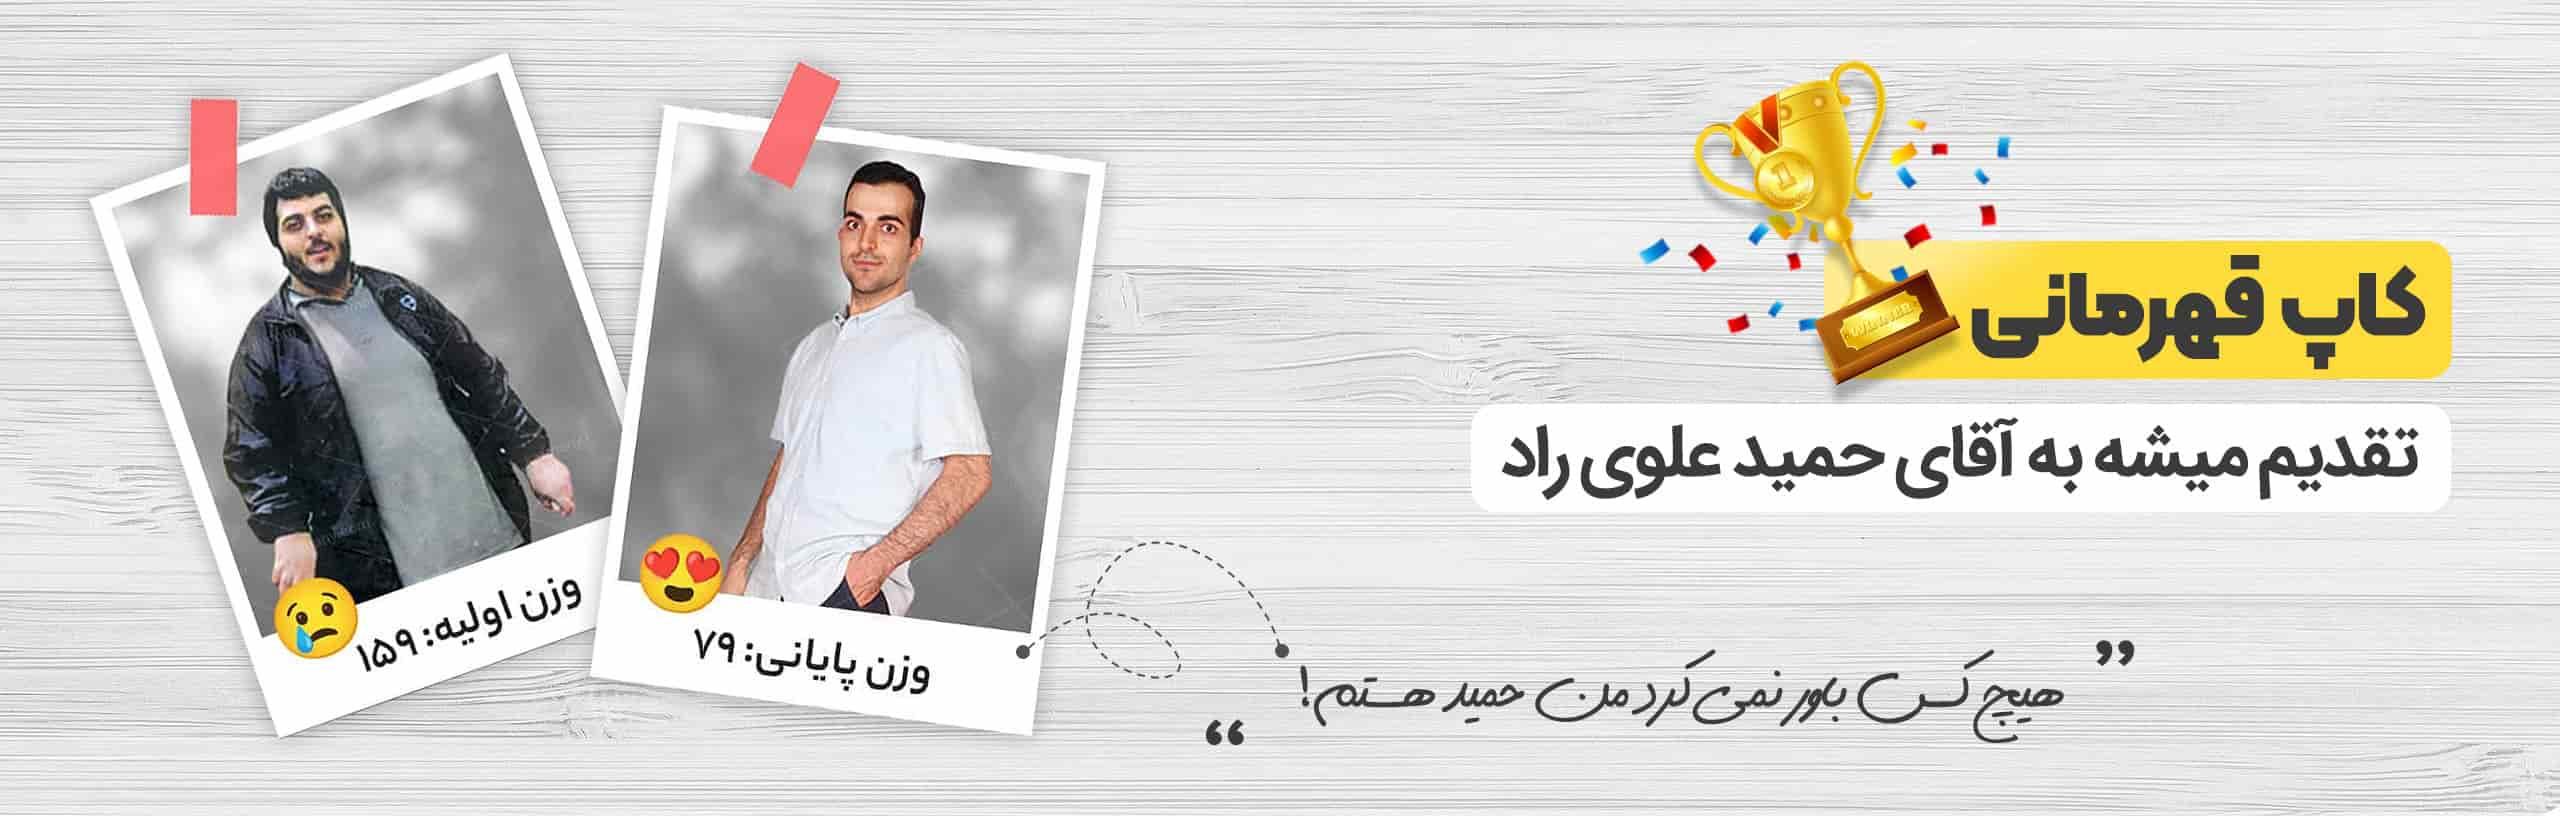 record bornafit desktop slider برنافیت دکتر کرمانی دکتر کرمانی